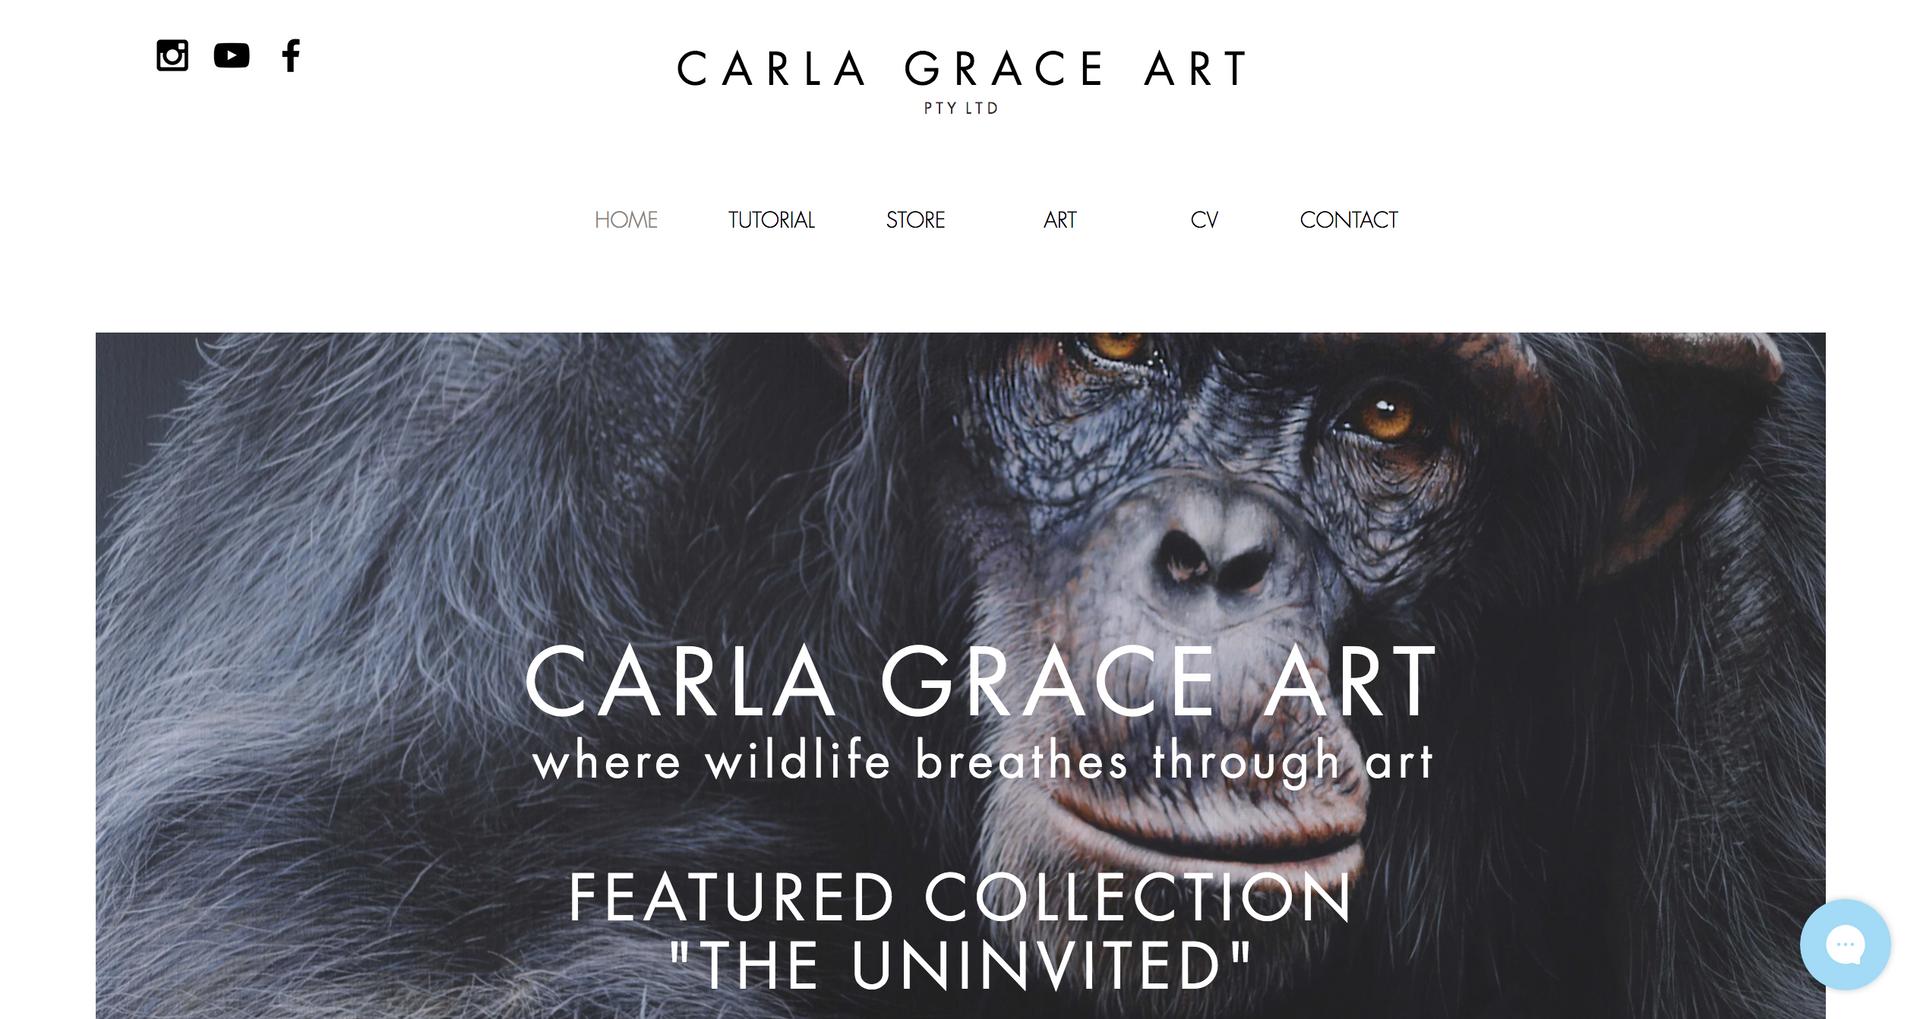 Carla Grace Art